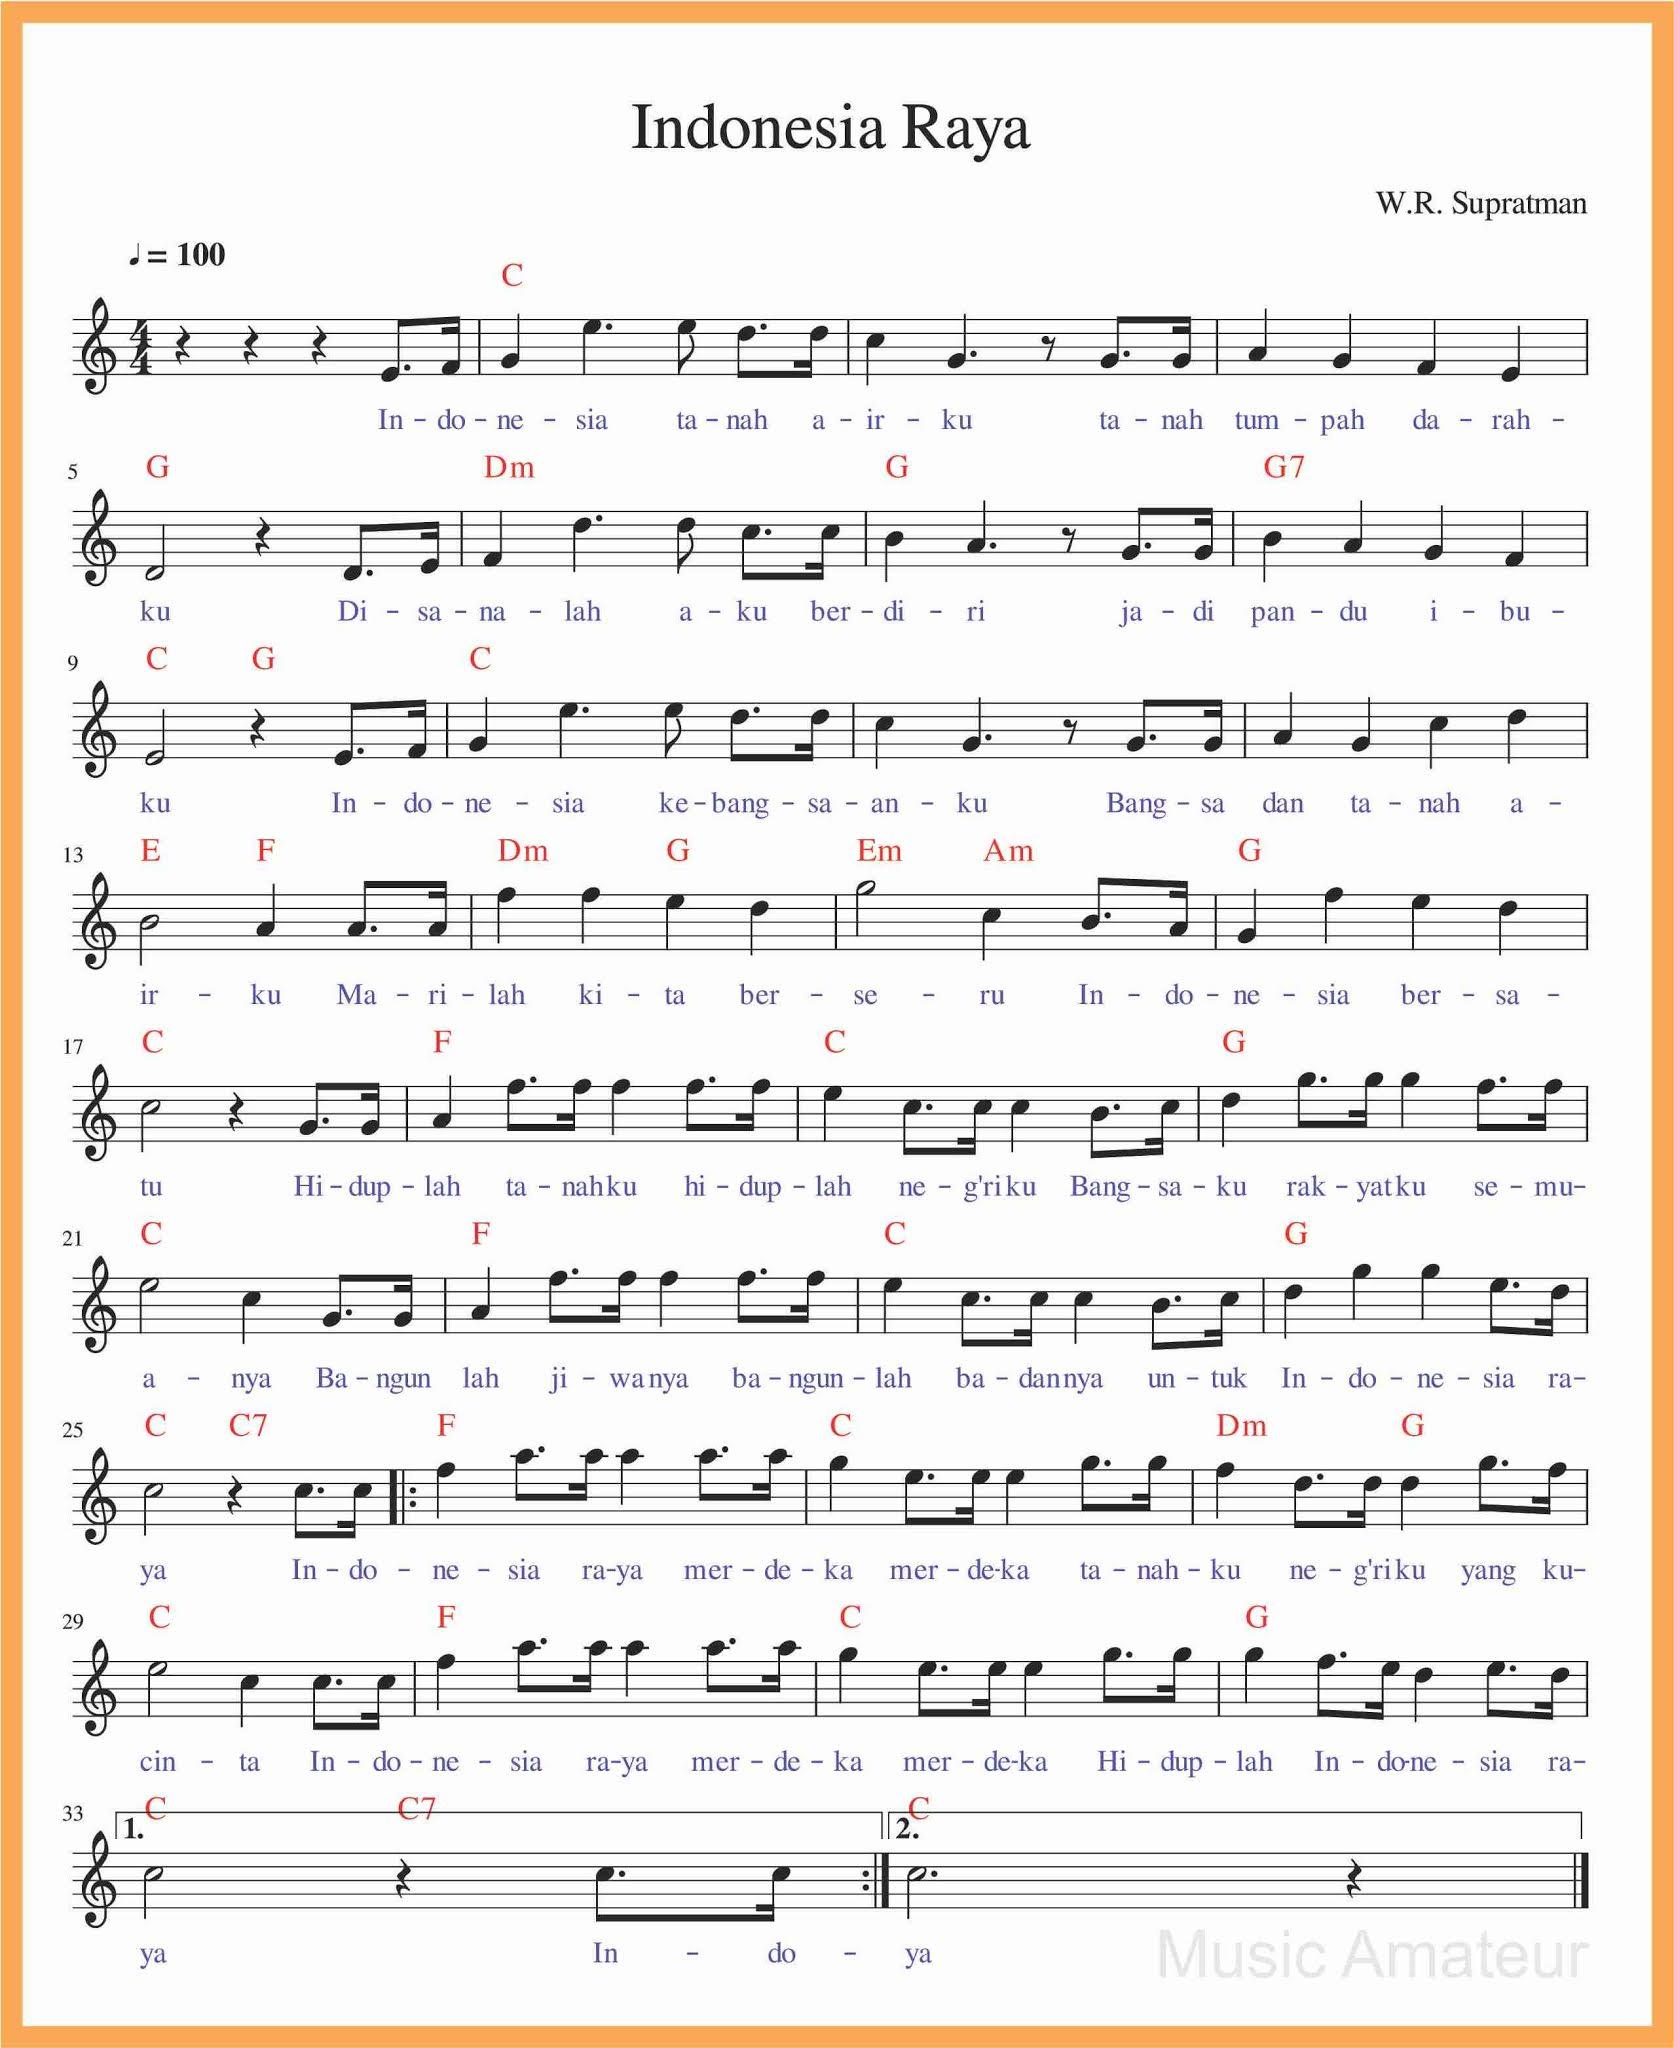 Not Angka Lagu Indonesia Raya : angka, indonesia, Angka, Indonesia, Stanza, SEPUTAR, MUSIK